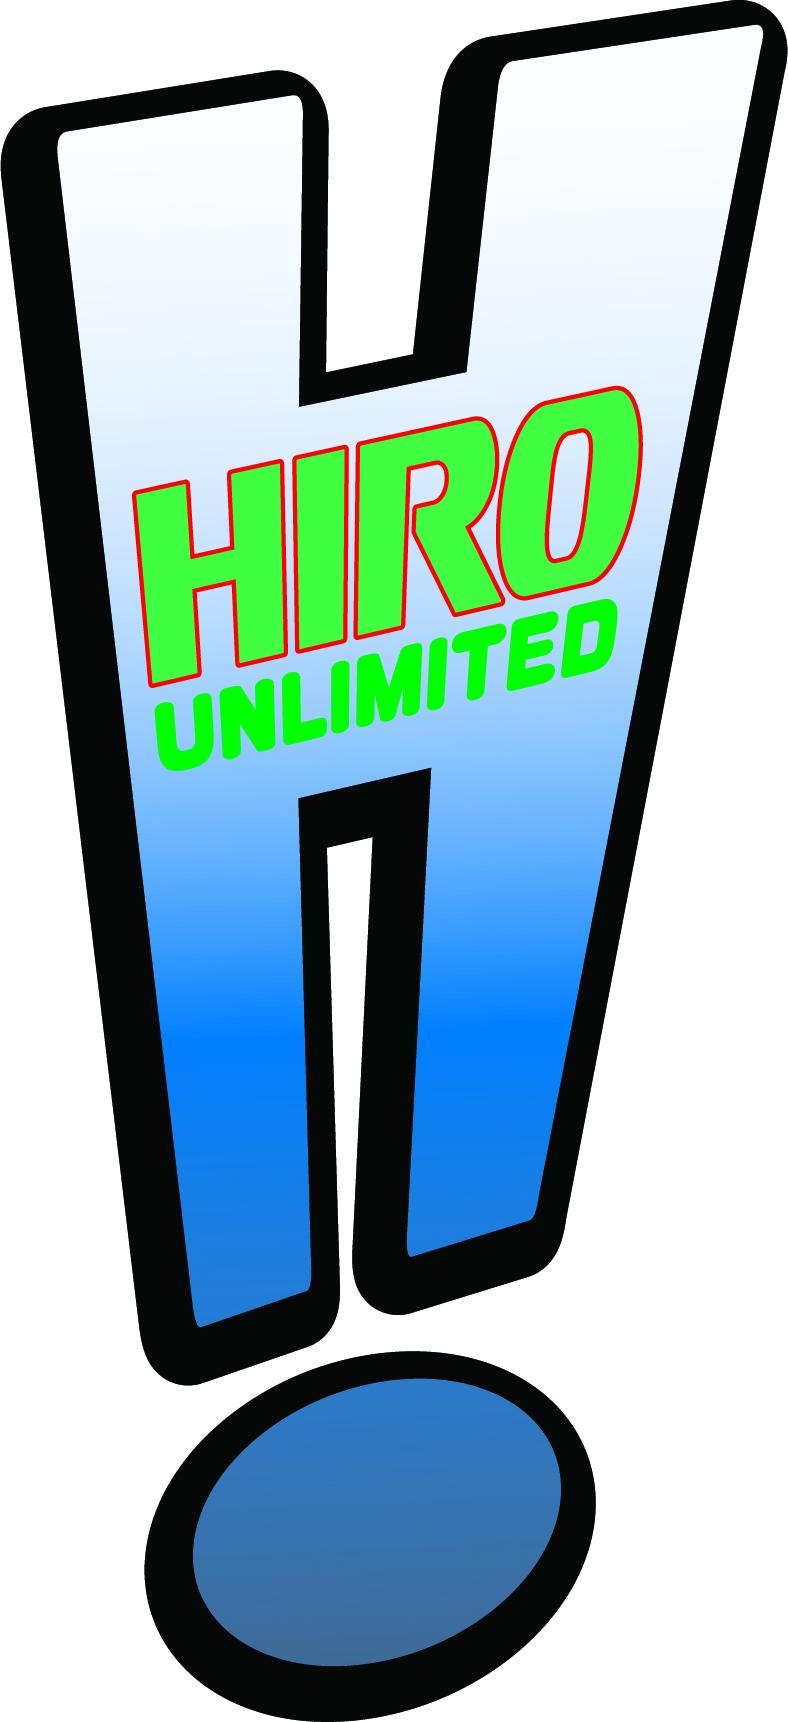 Hiro Unlimited